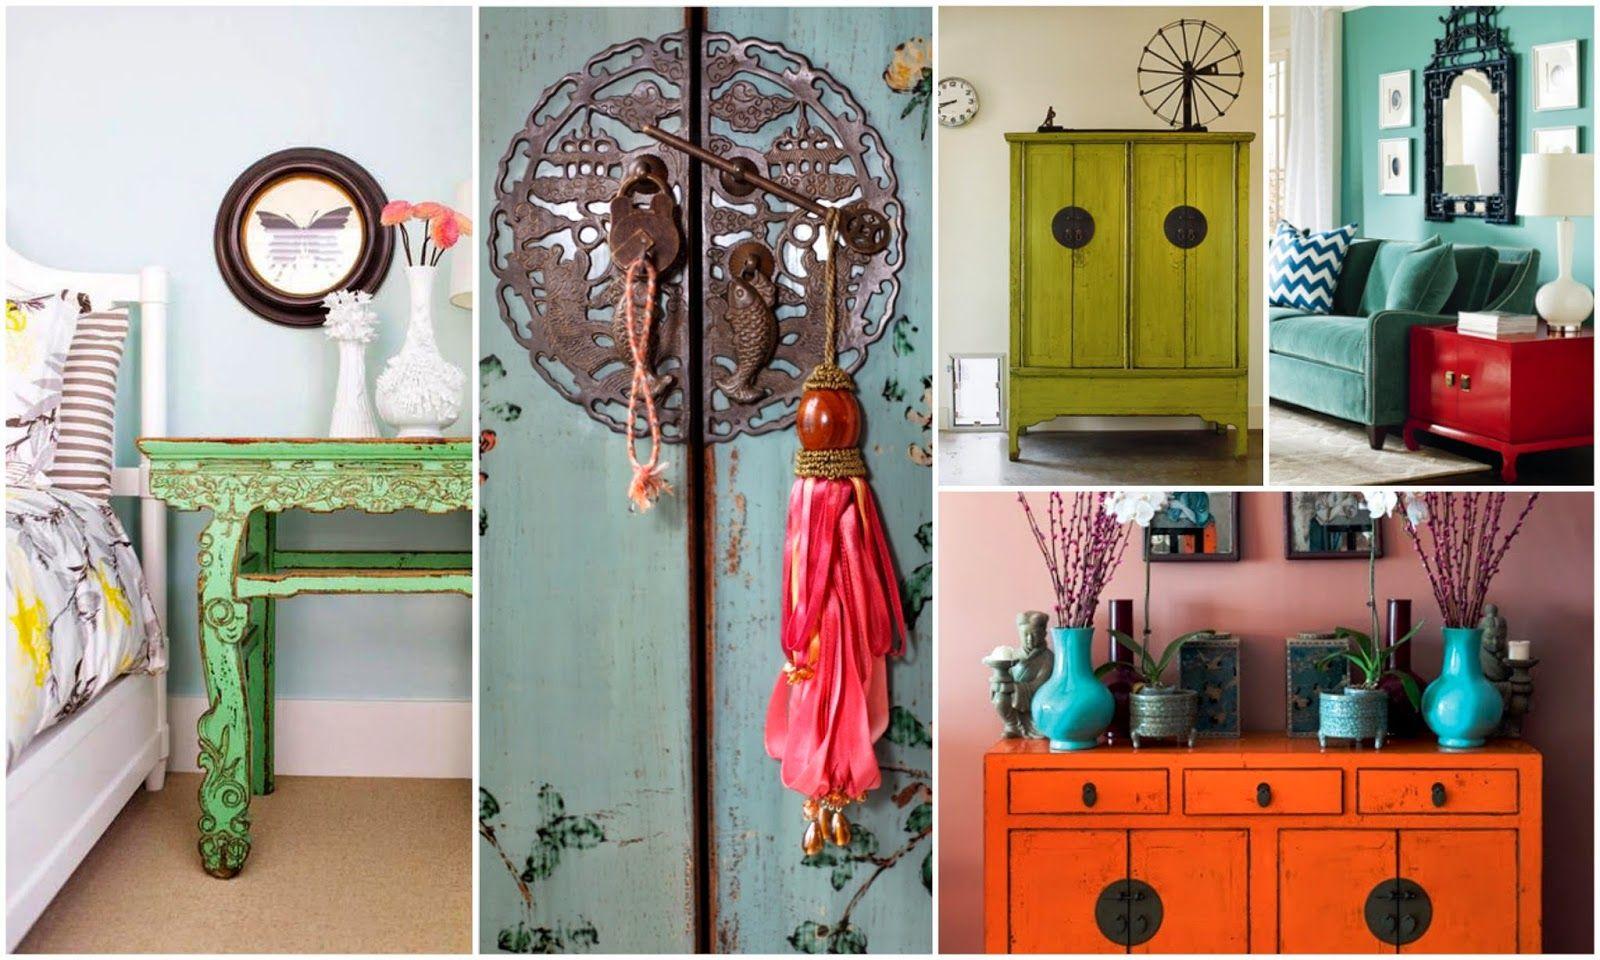 Modern Asian Decor - Color! #PinspirationThursdays